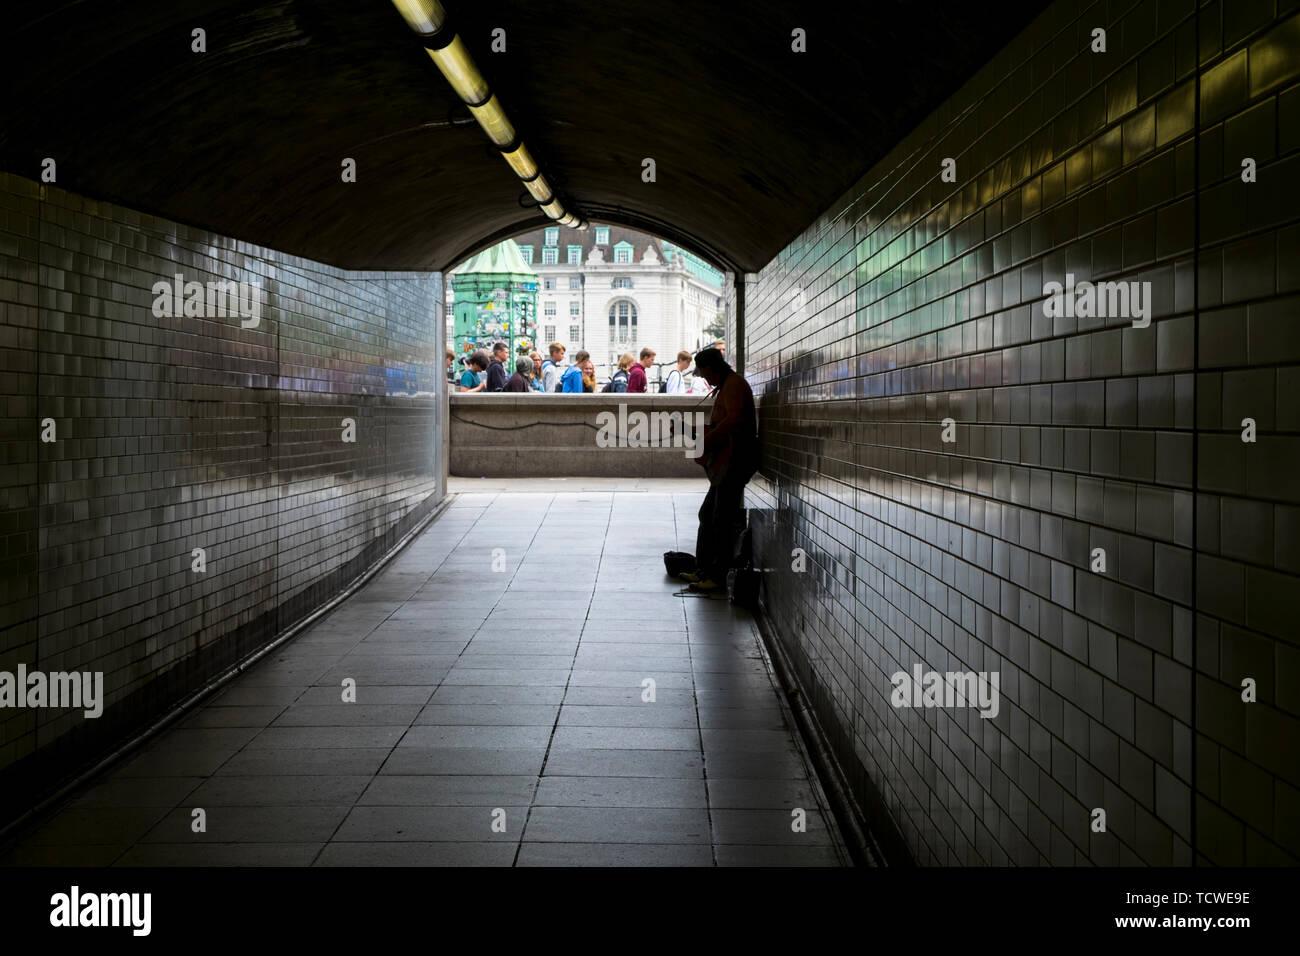 Busker in an underground passageway, london, uk Stock Photo